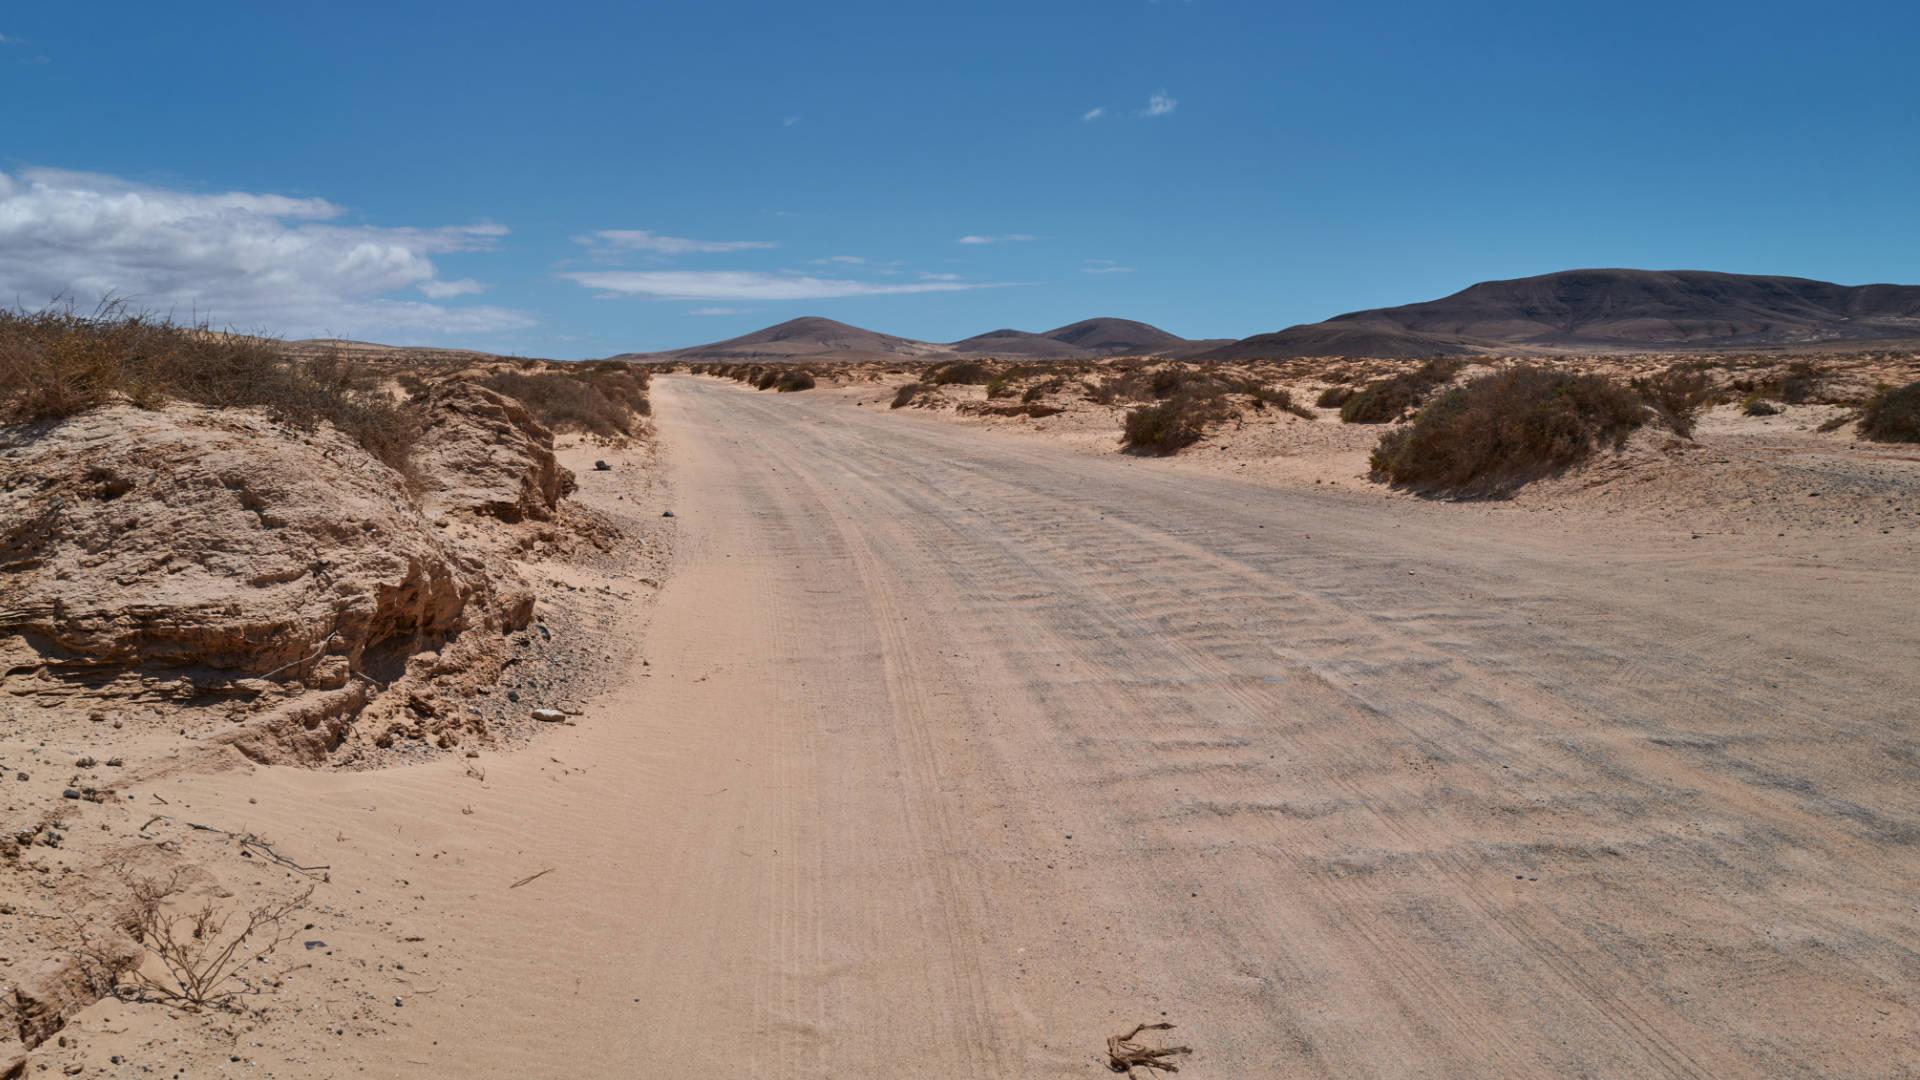 Der Cañada de Melián nahe Lajares Fuerteventura.